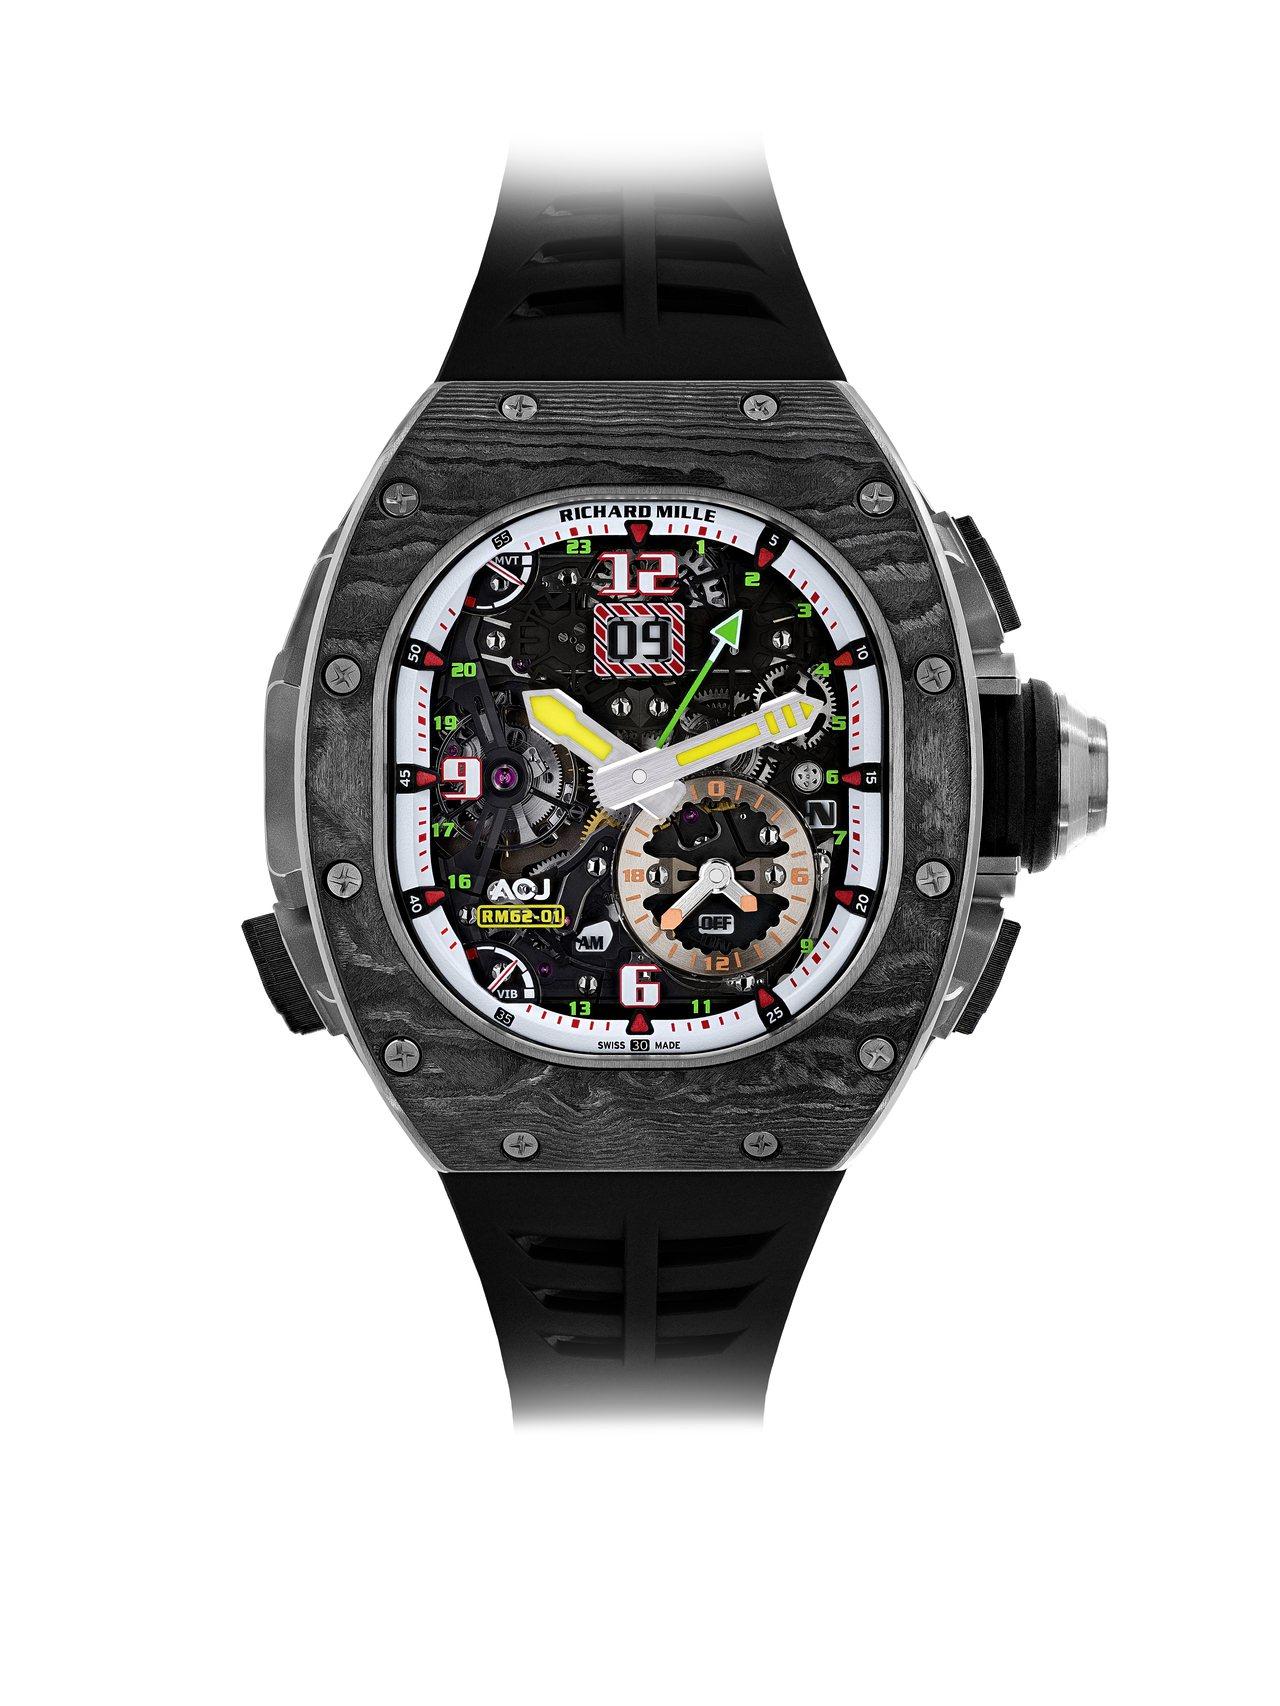 RICHARD MILLE RM 62-01 ACJ陀飛輪振動鬧鈴腕表,鈦合金與...